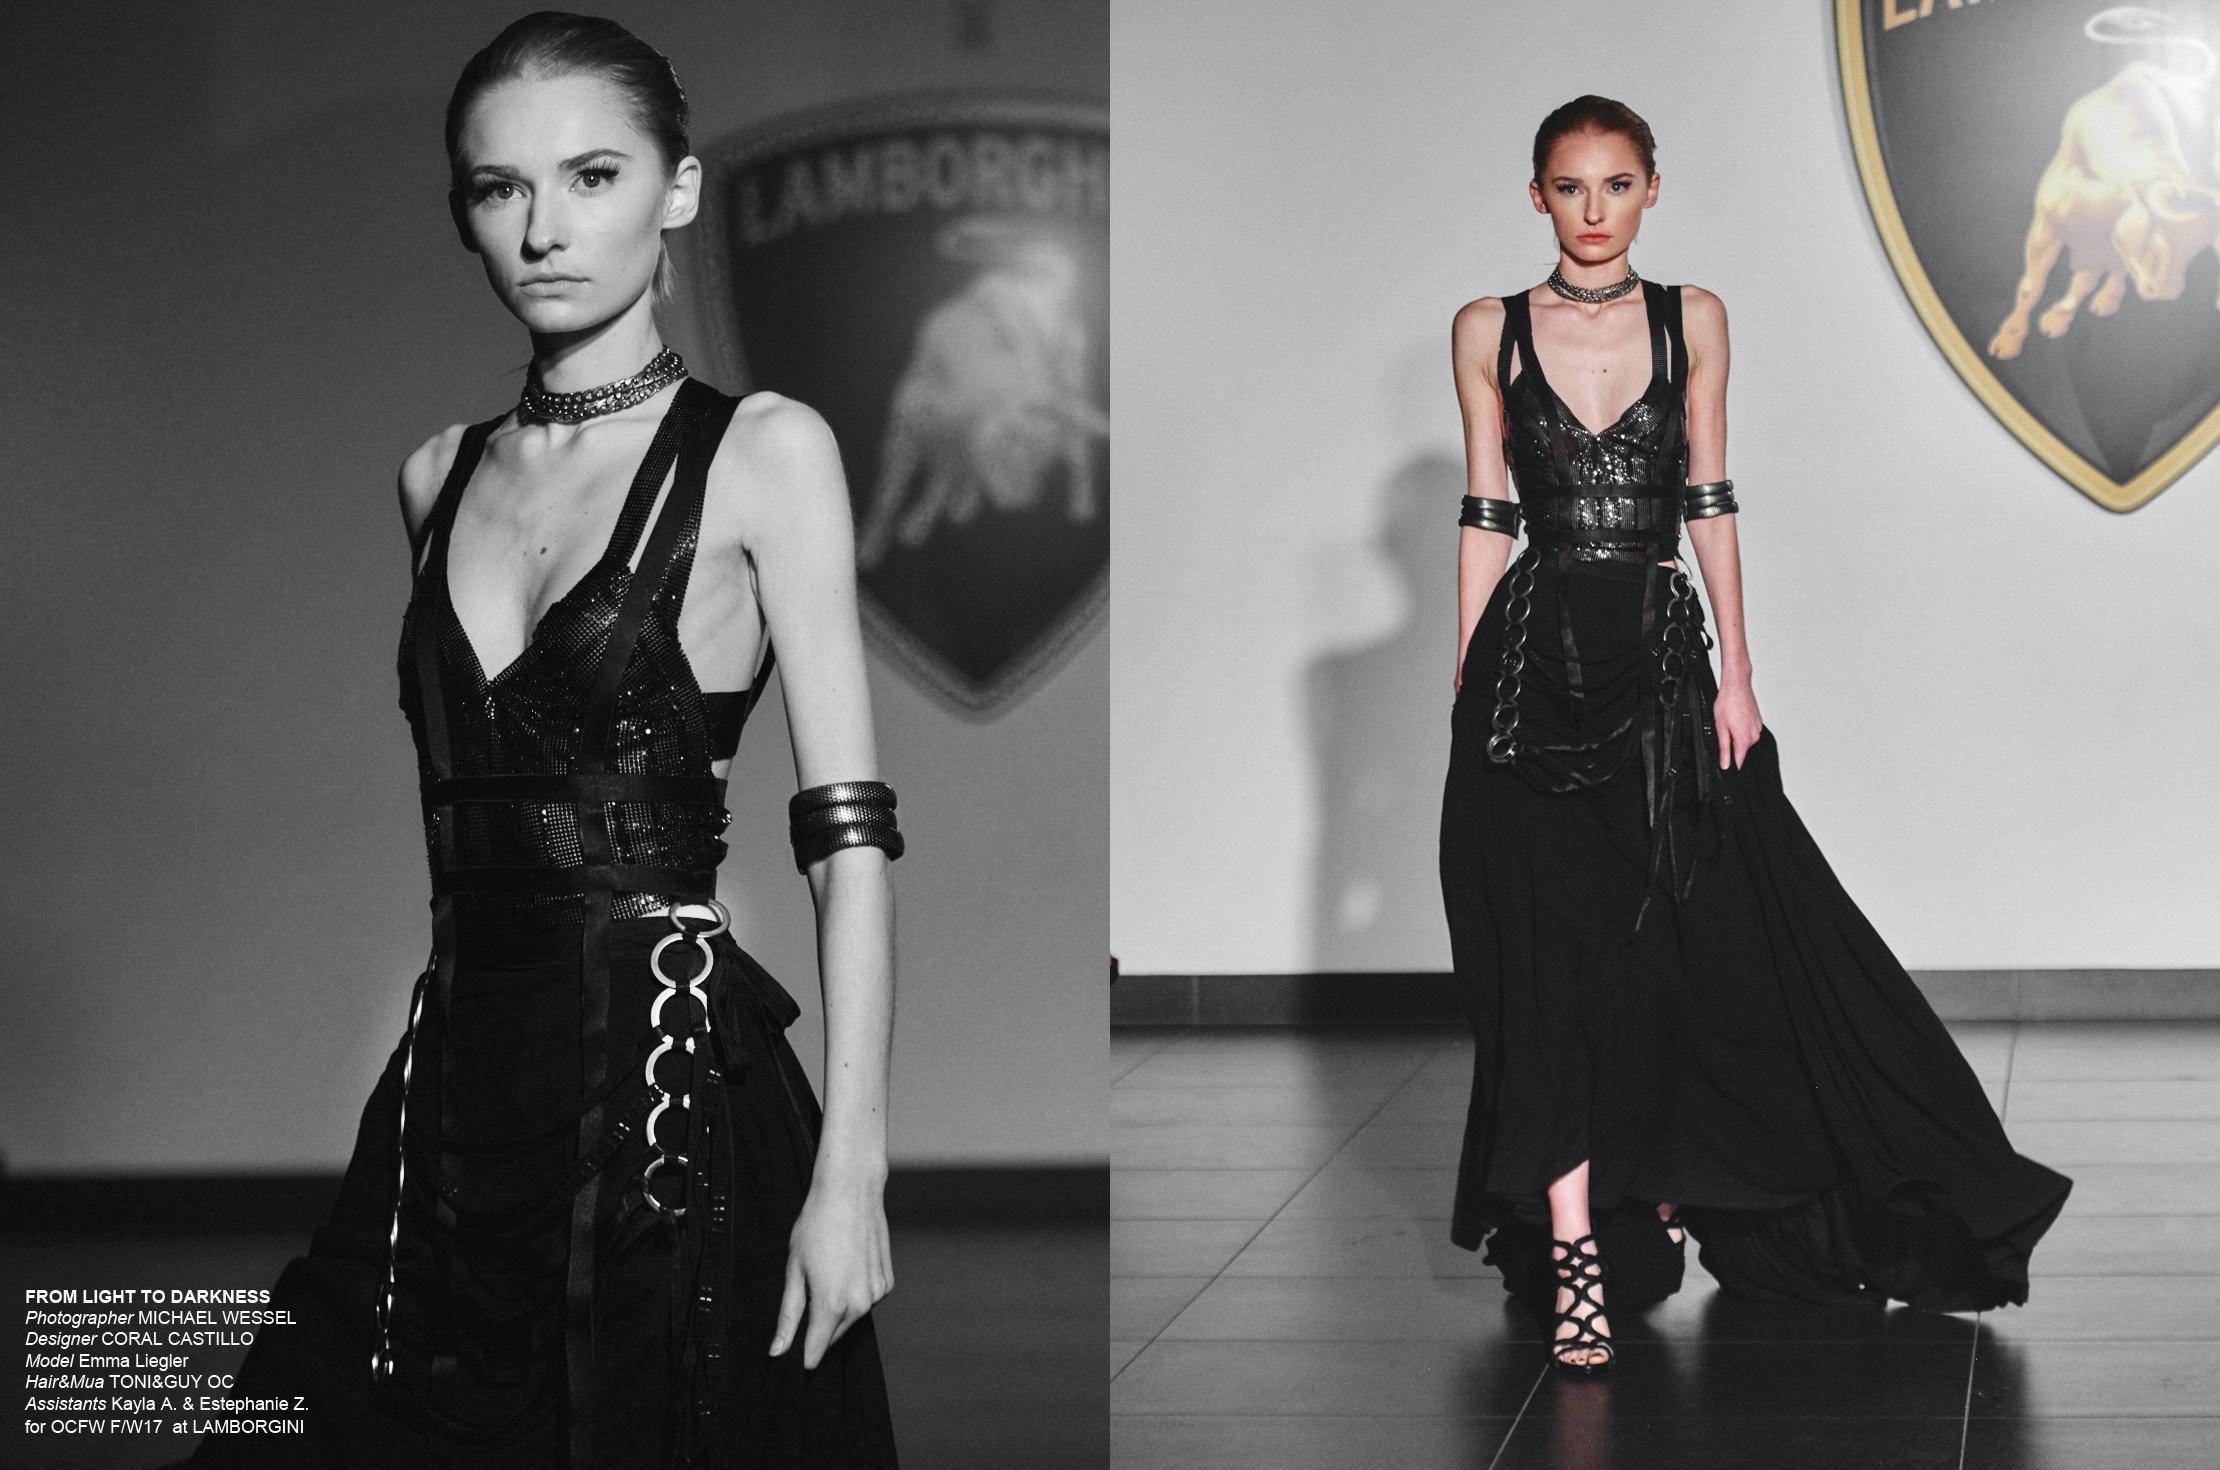 Coral Castillo - OC Fashion Week March 2017 - Photos by Michael Wessel & cREAtive Castle Studios (www.creativecastlestudios.com-Coral-Castillo and www.creativecastlestudios.com-michael-wessel)-5.jpg